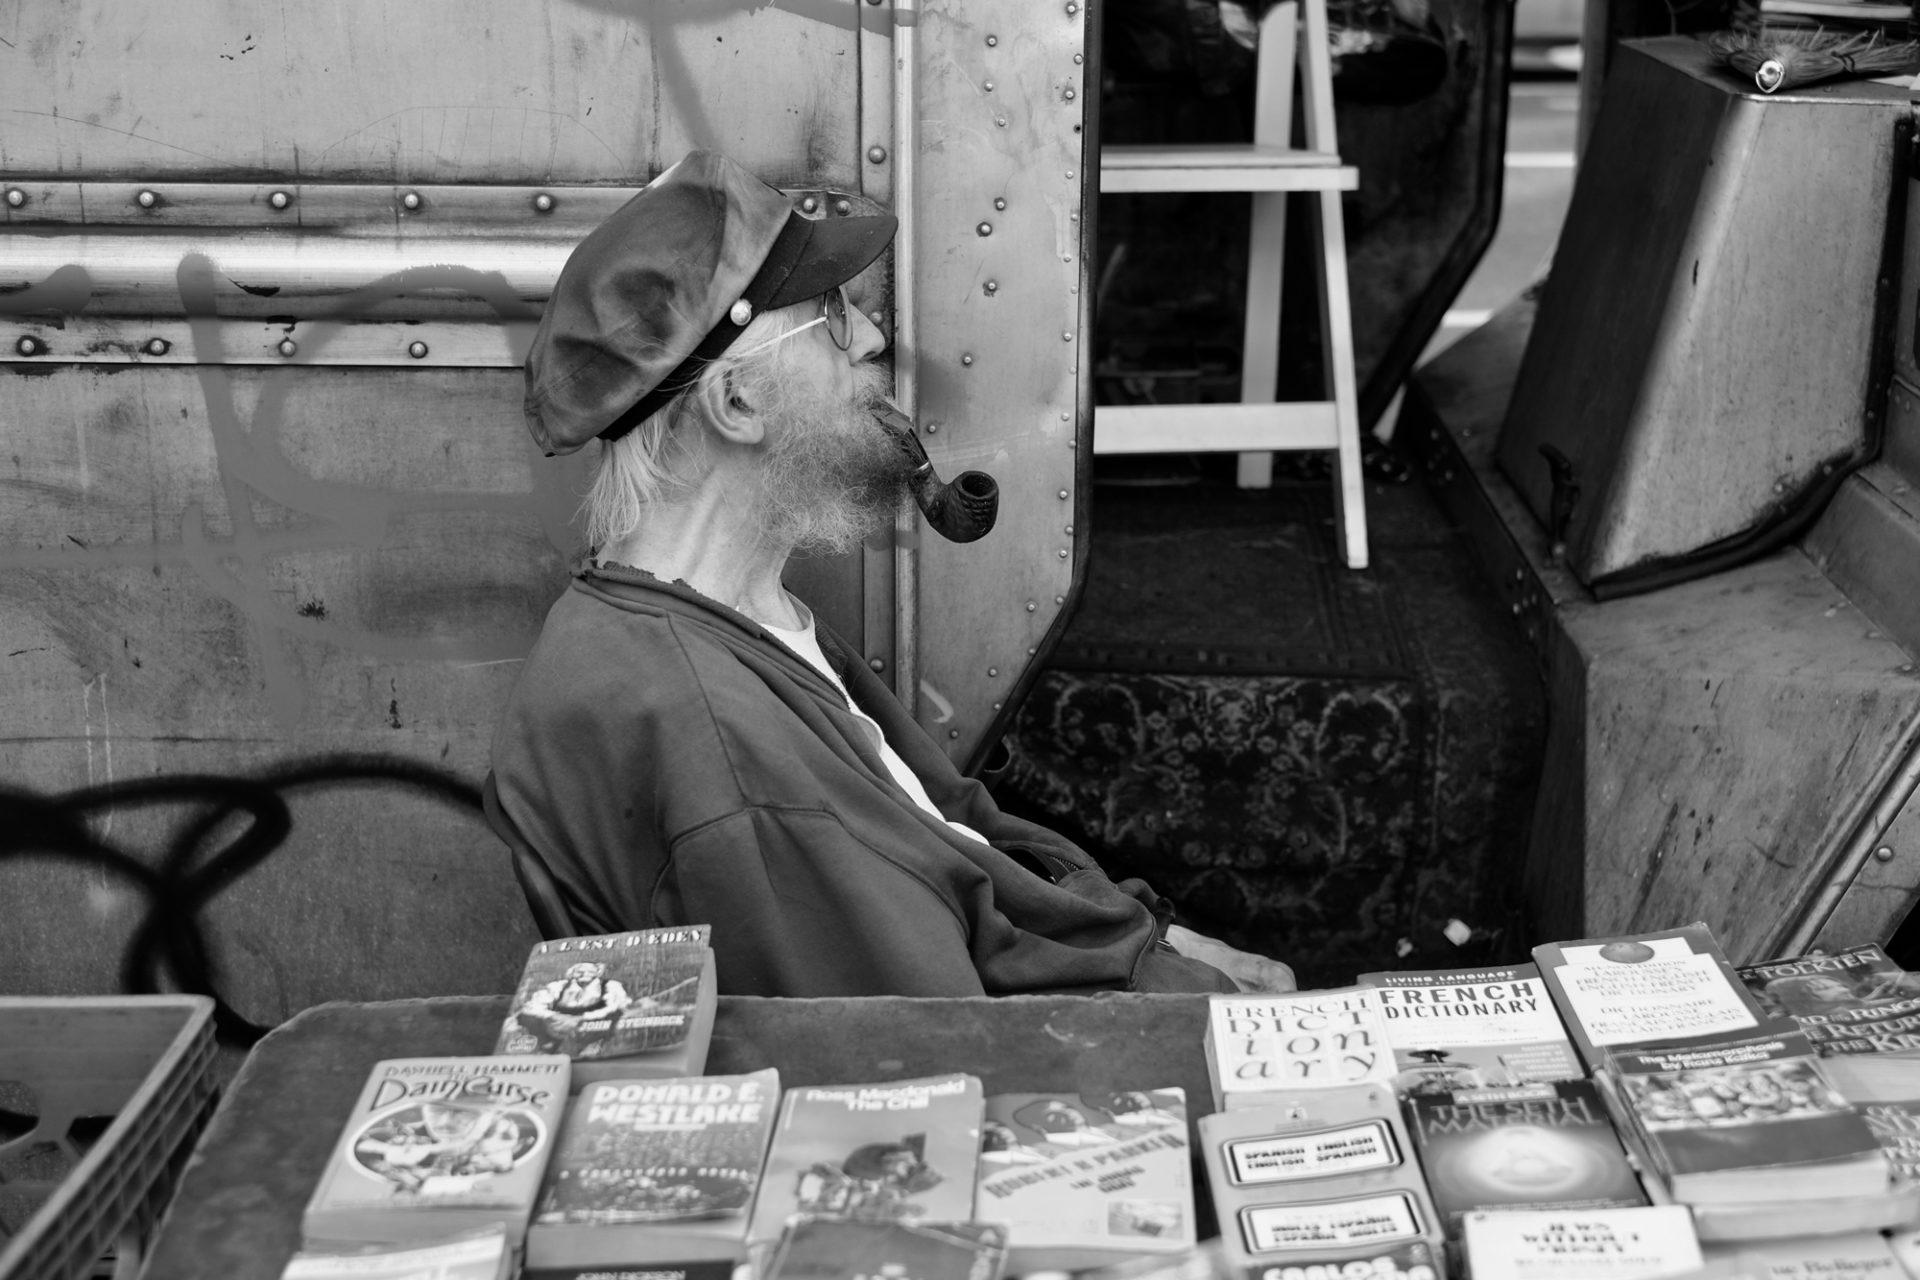 Ingeborg Portales. Entre soñadores y desconectados. The Bookseller.